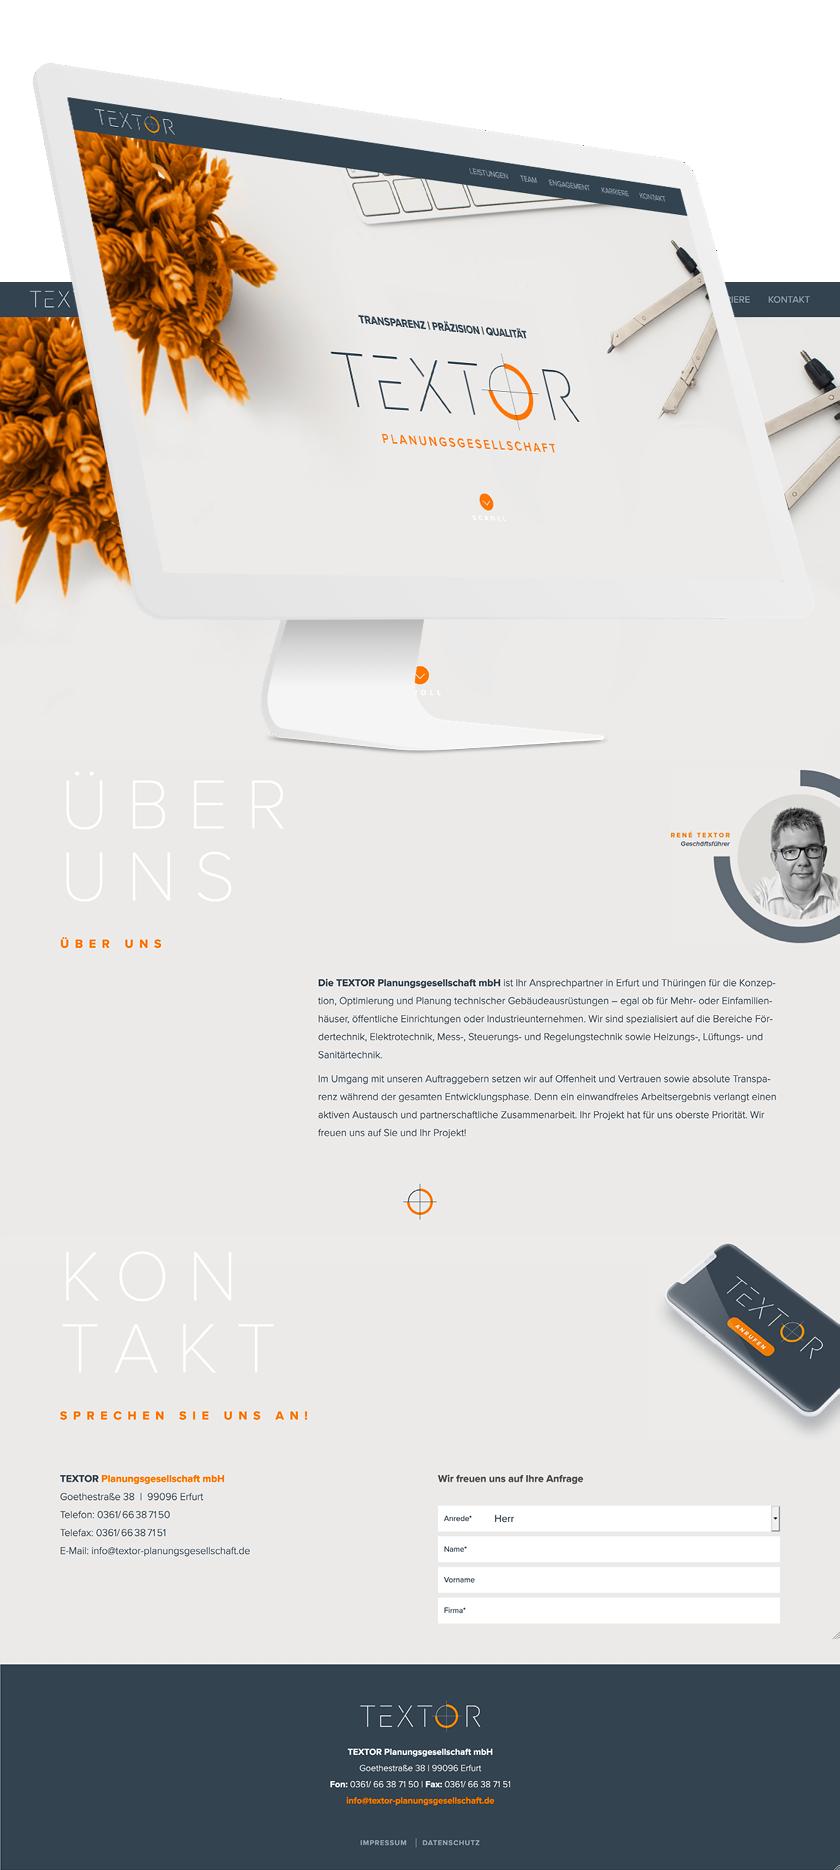 Samt&Seidel_Referenz_Textor_Planungsgesellschaft_Design_02